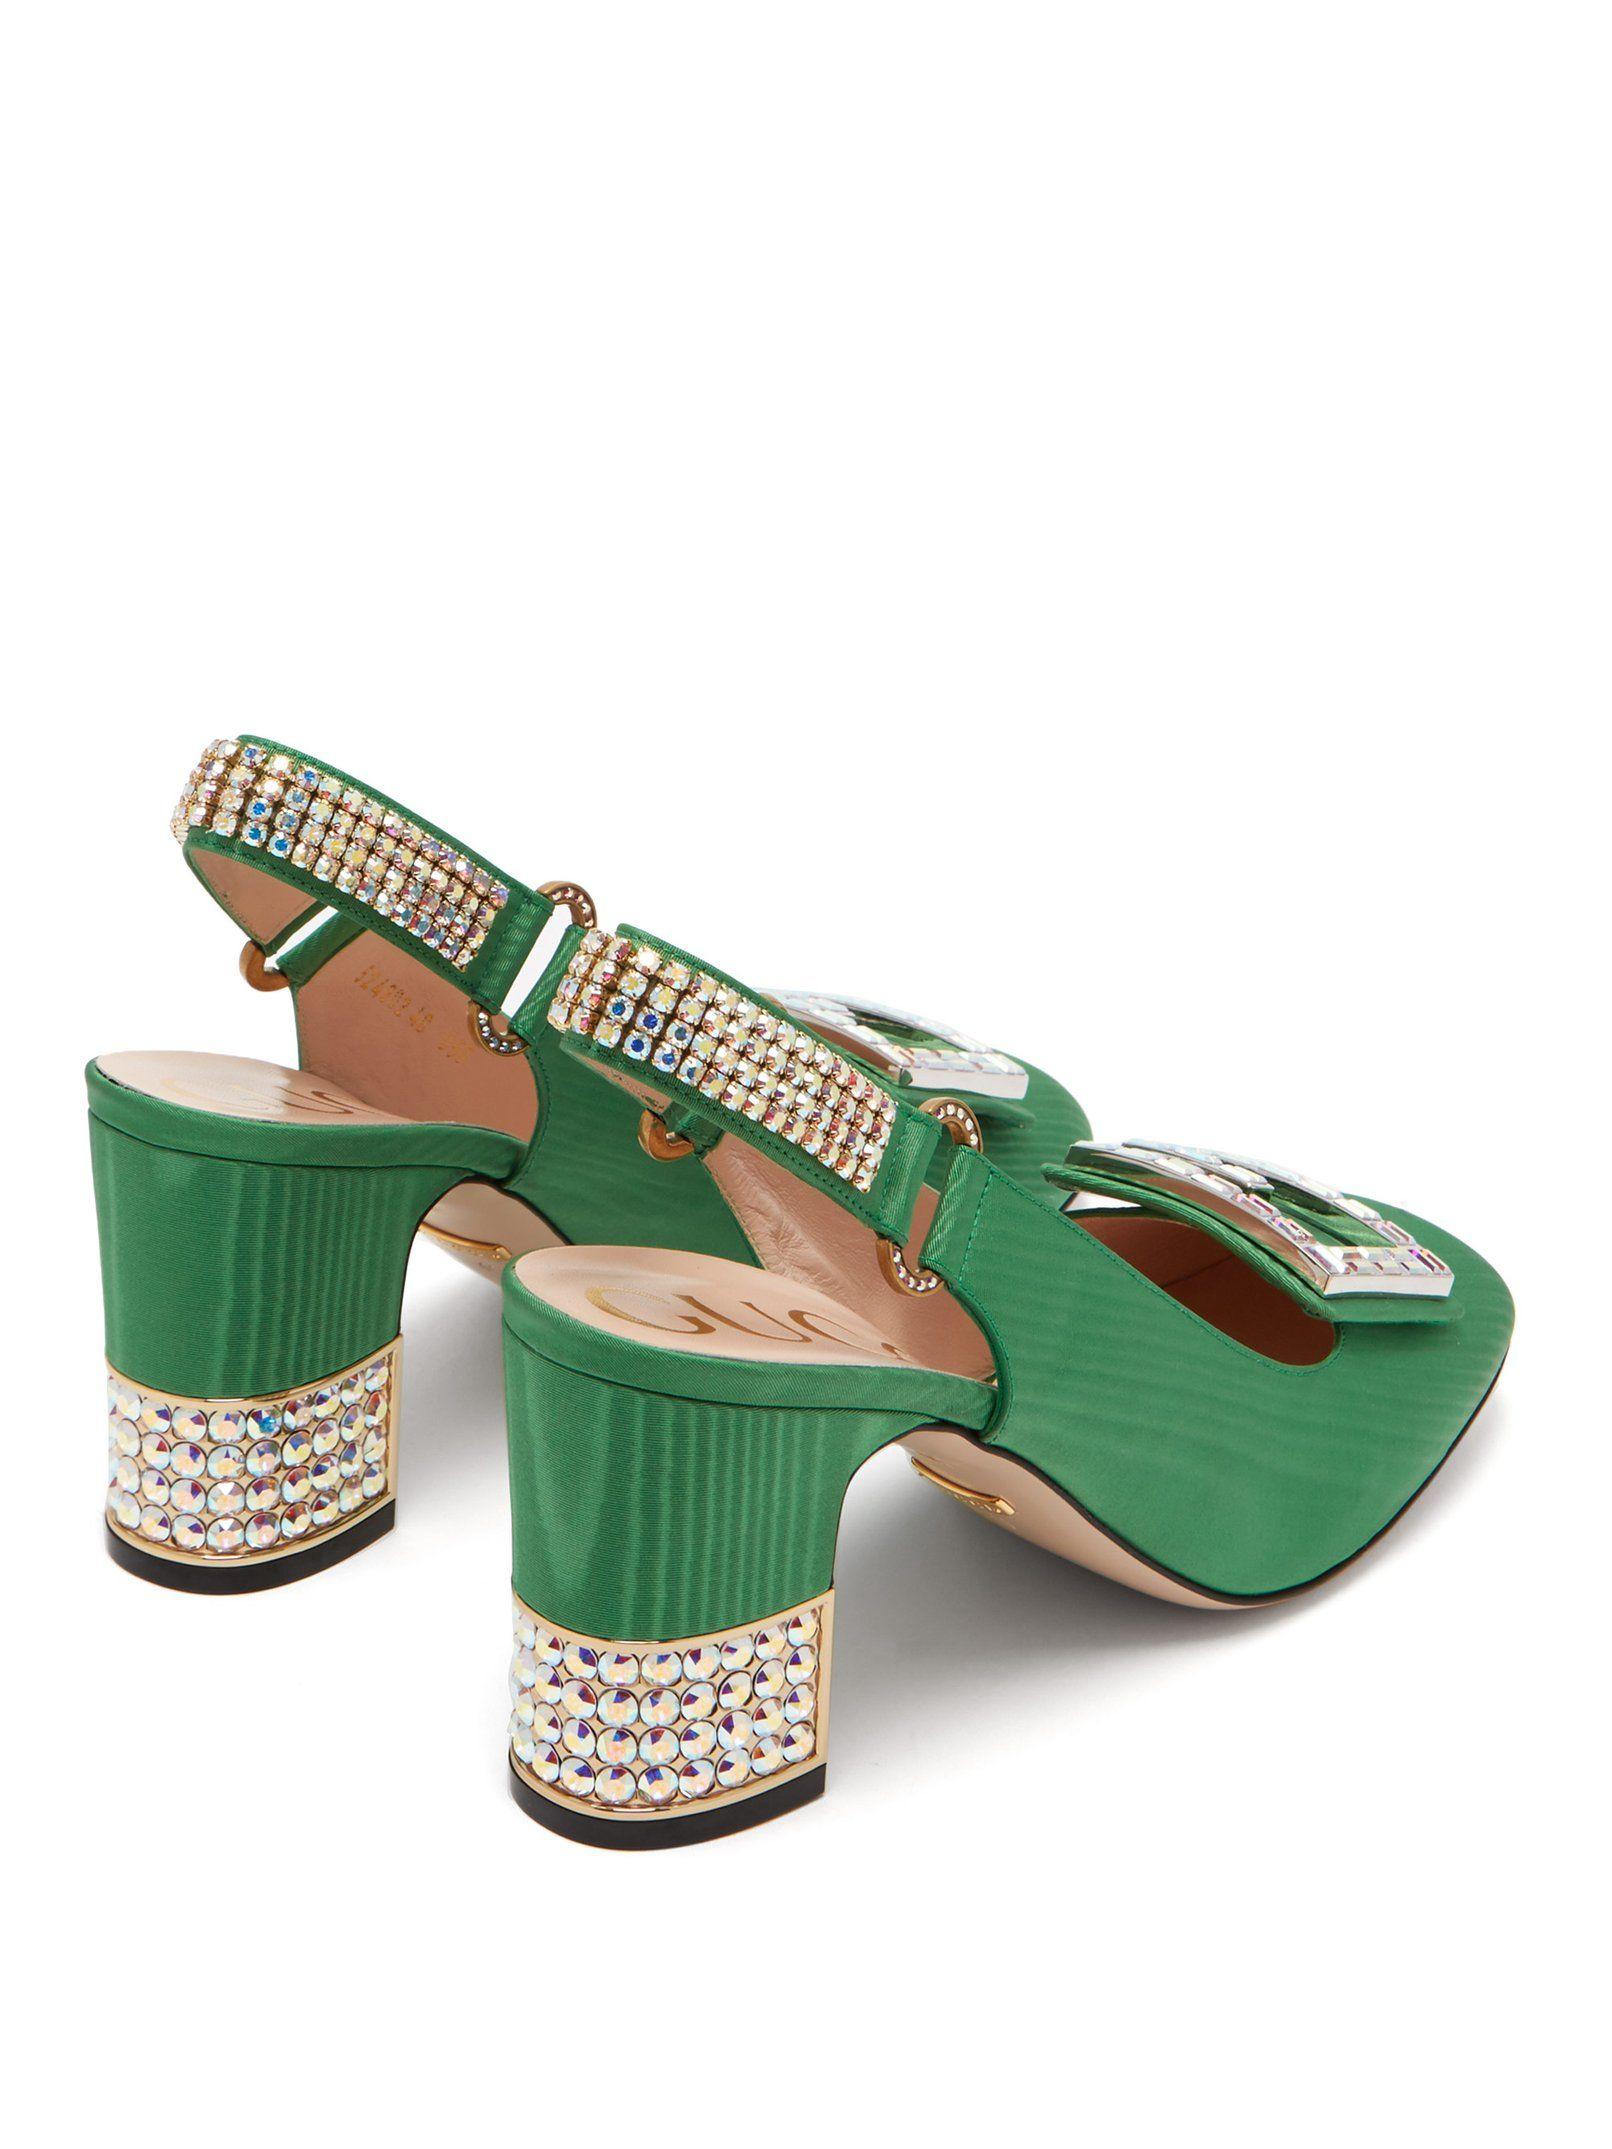 a7e78e2fe7 Madelyn crystal-embellished moiré slingback pumps | Gucci |  MATCHESFASHION.COM UK